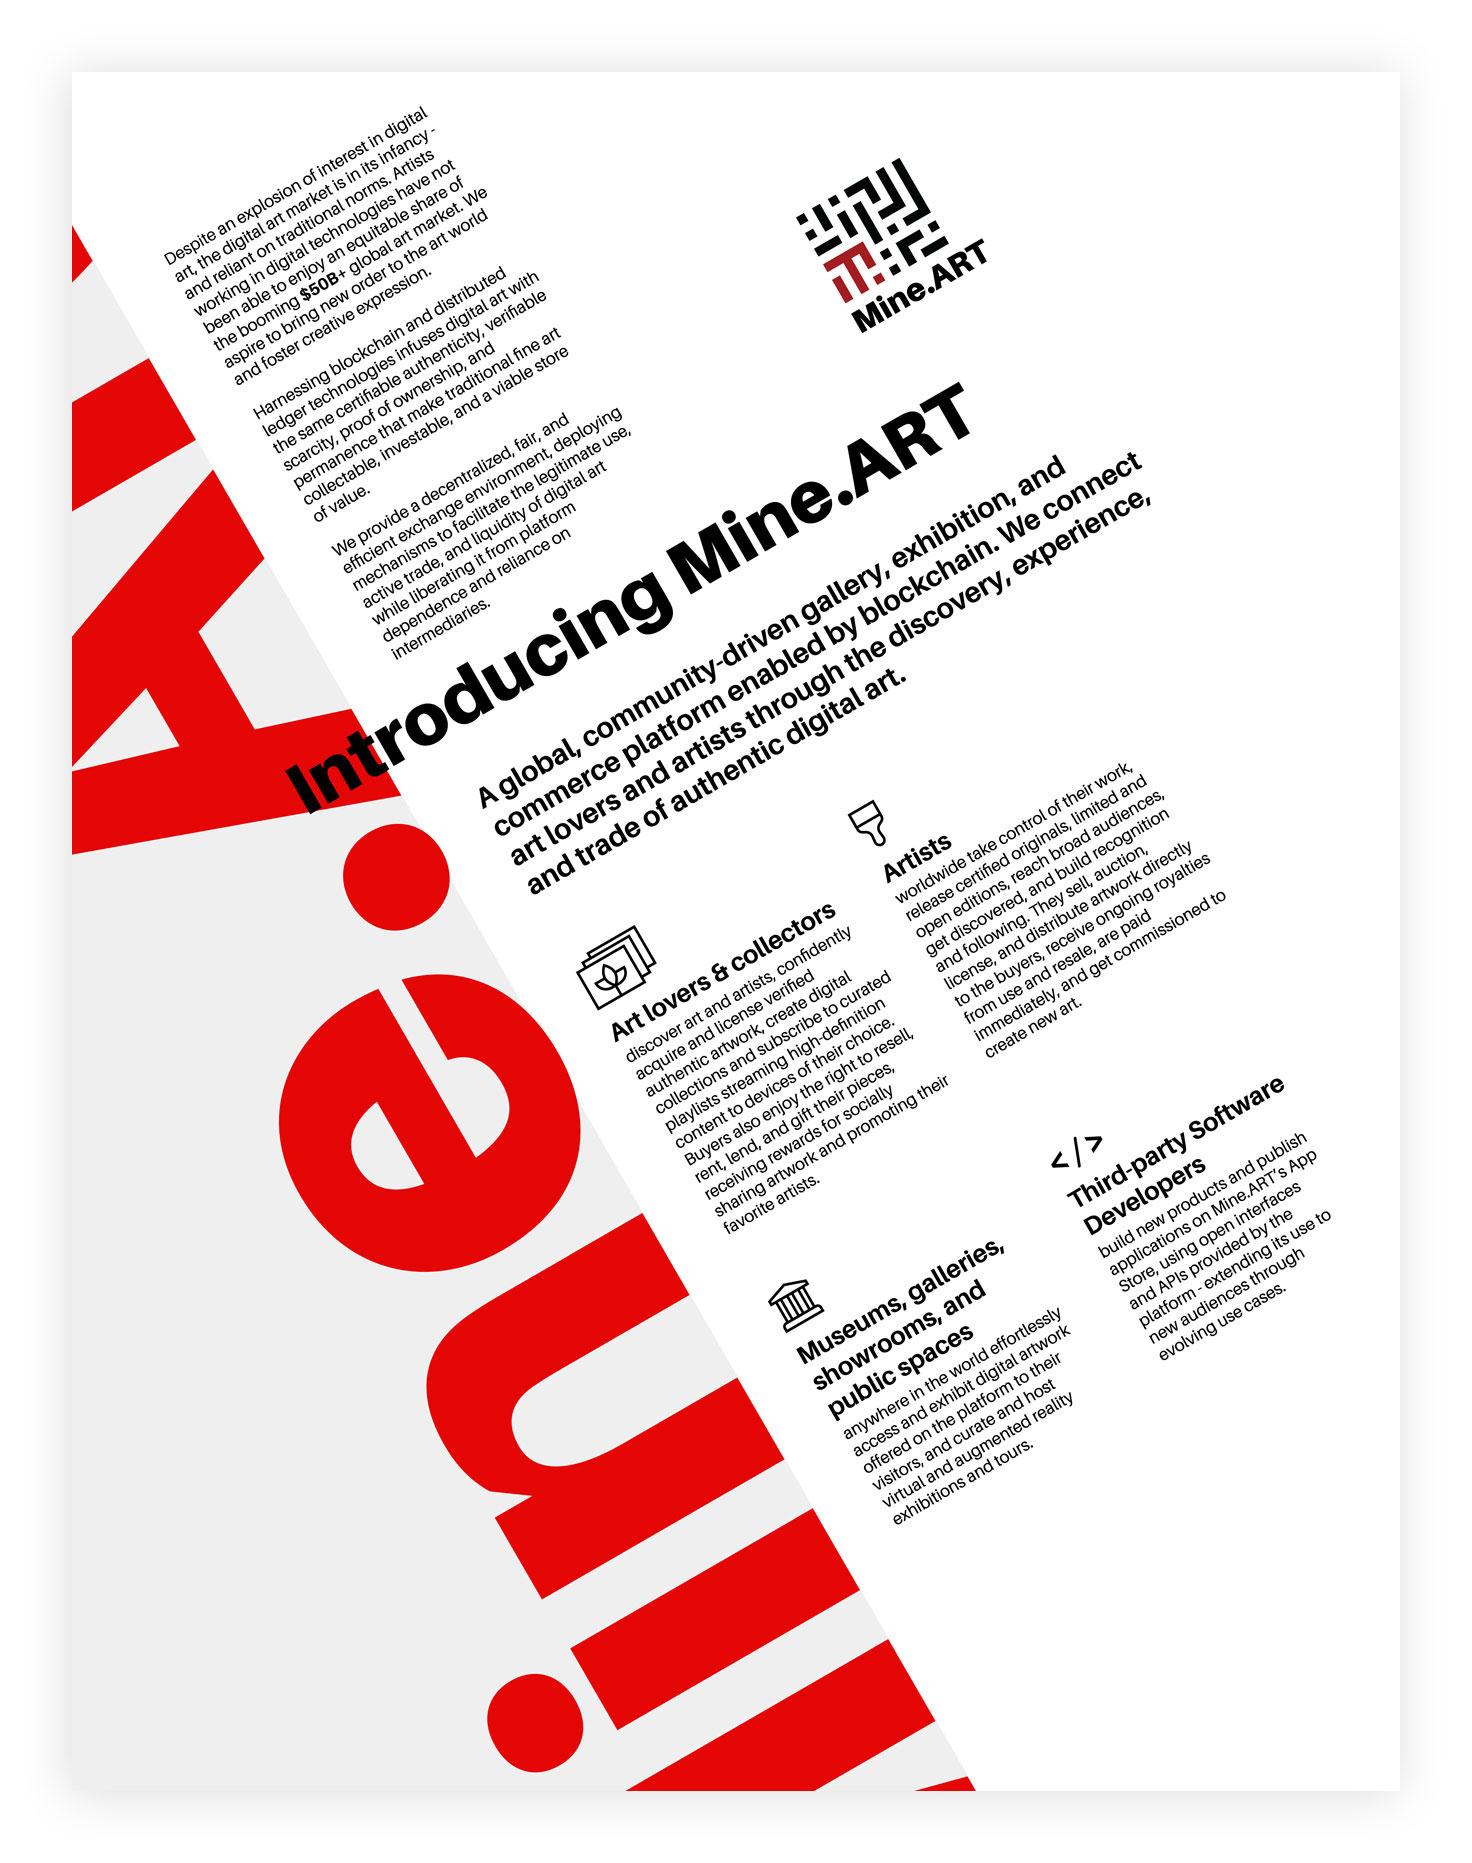 Startup-Presentaiton-Design-MineArt-Page-1.jpg